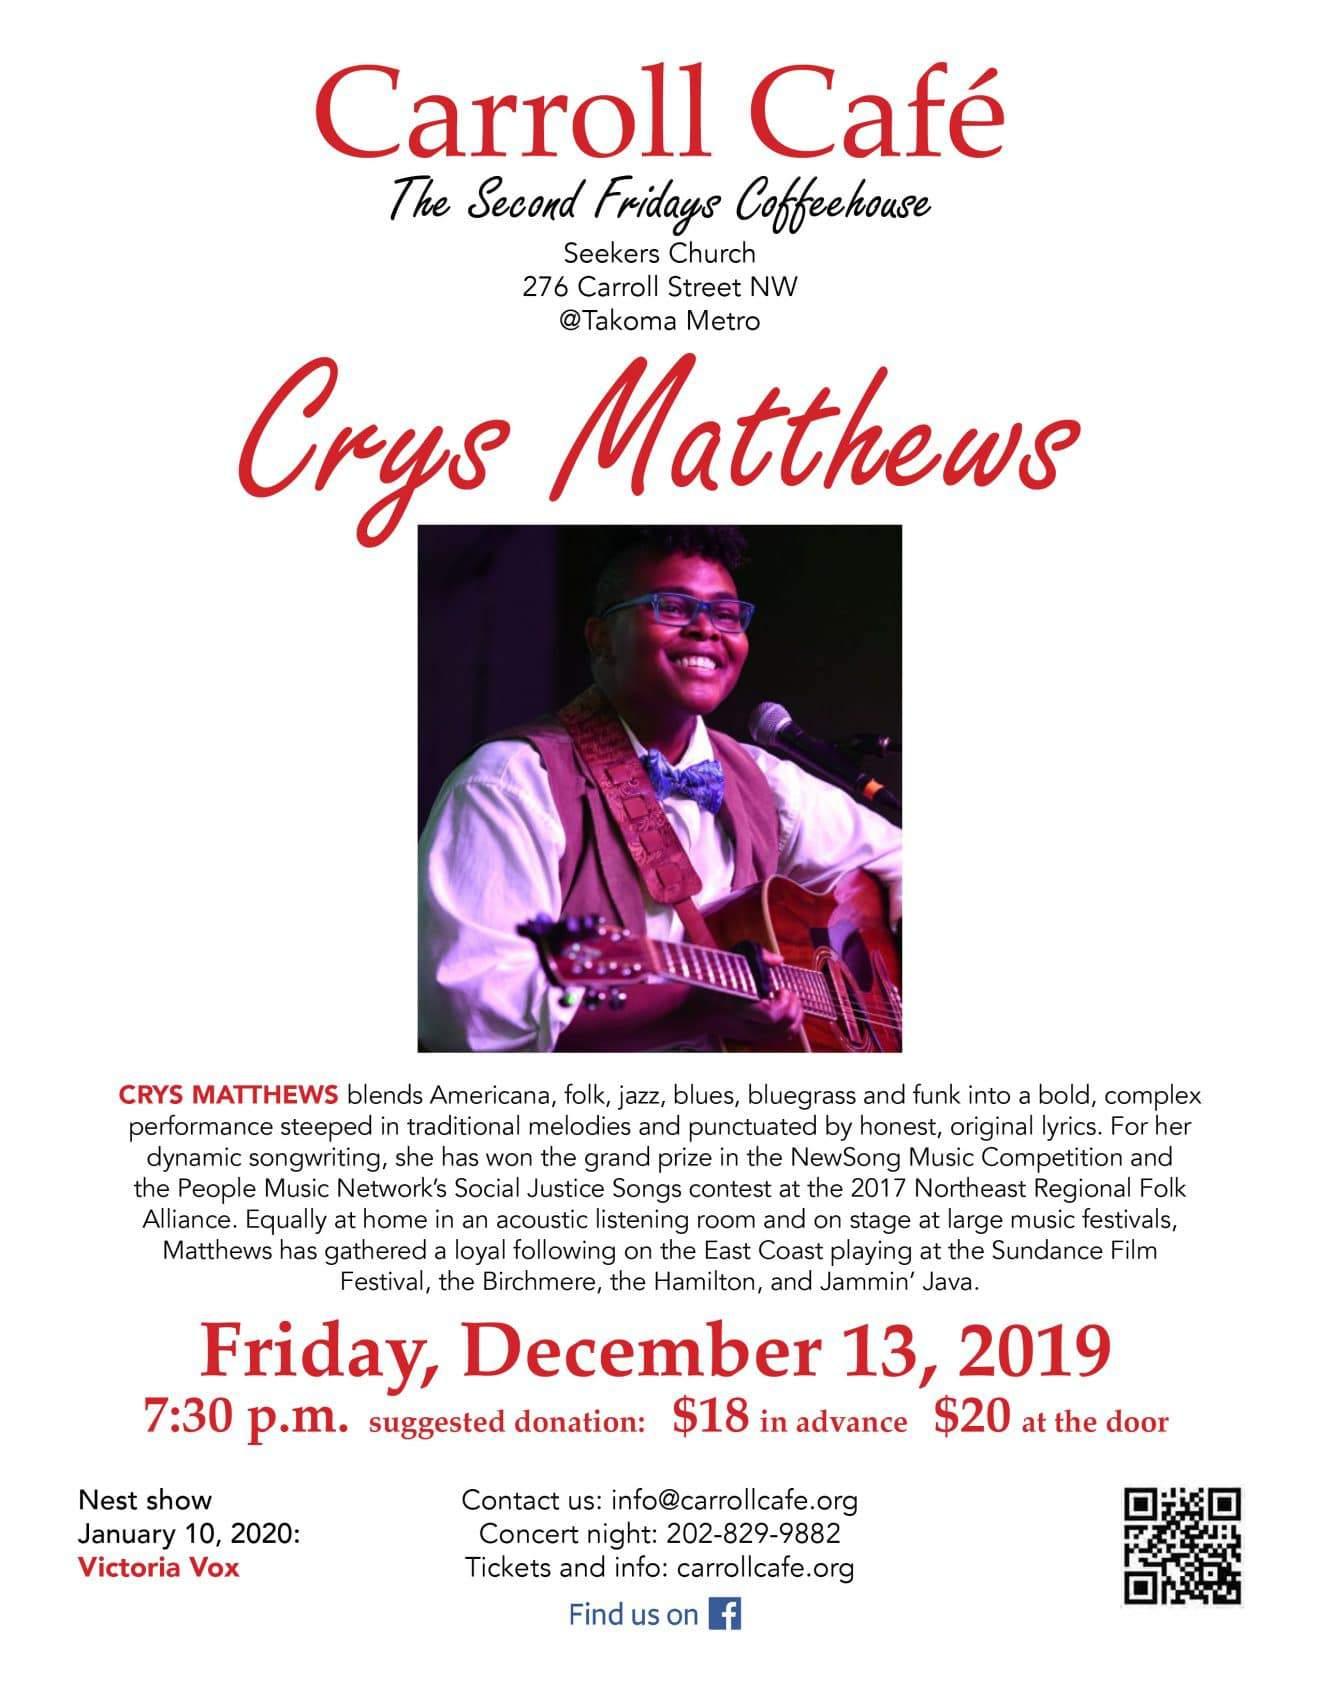 Carroll Cafe presents CRYS MATTHEWS